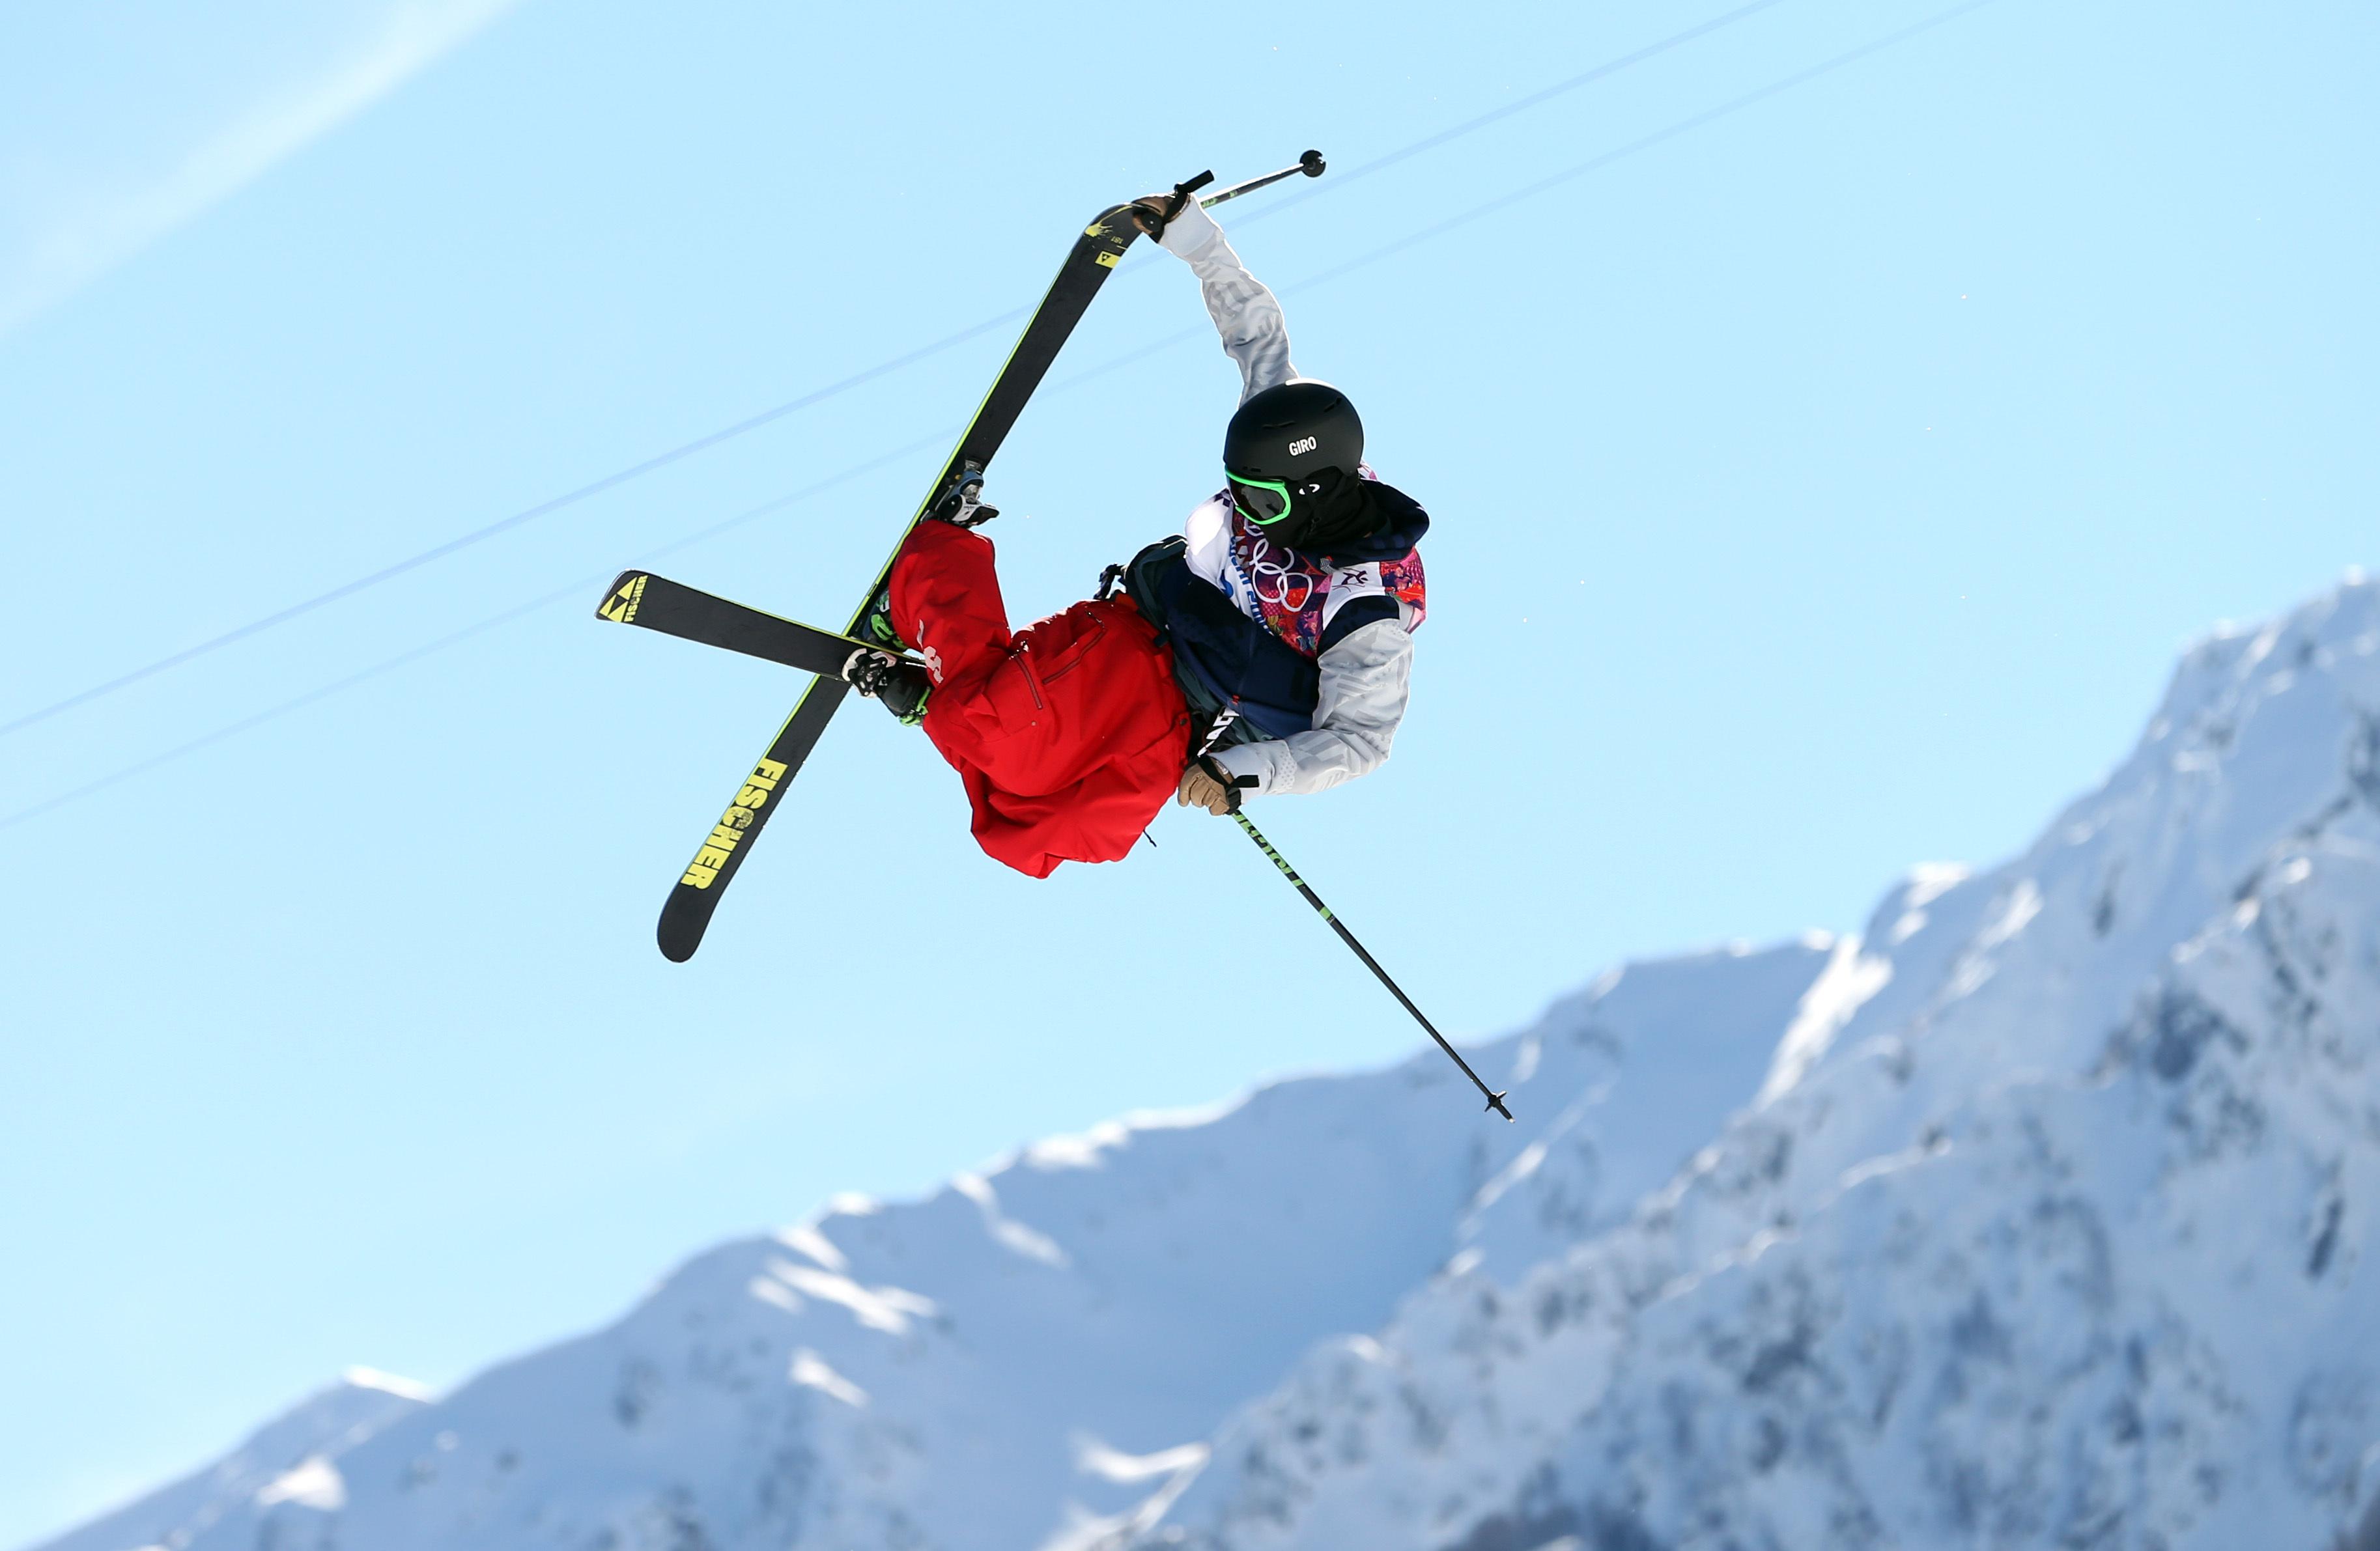 freestyle skiing wallpaper - photo #20